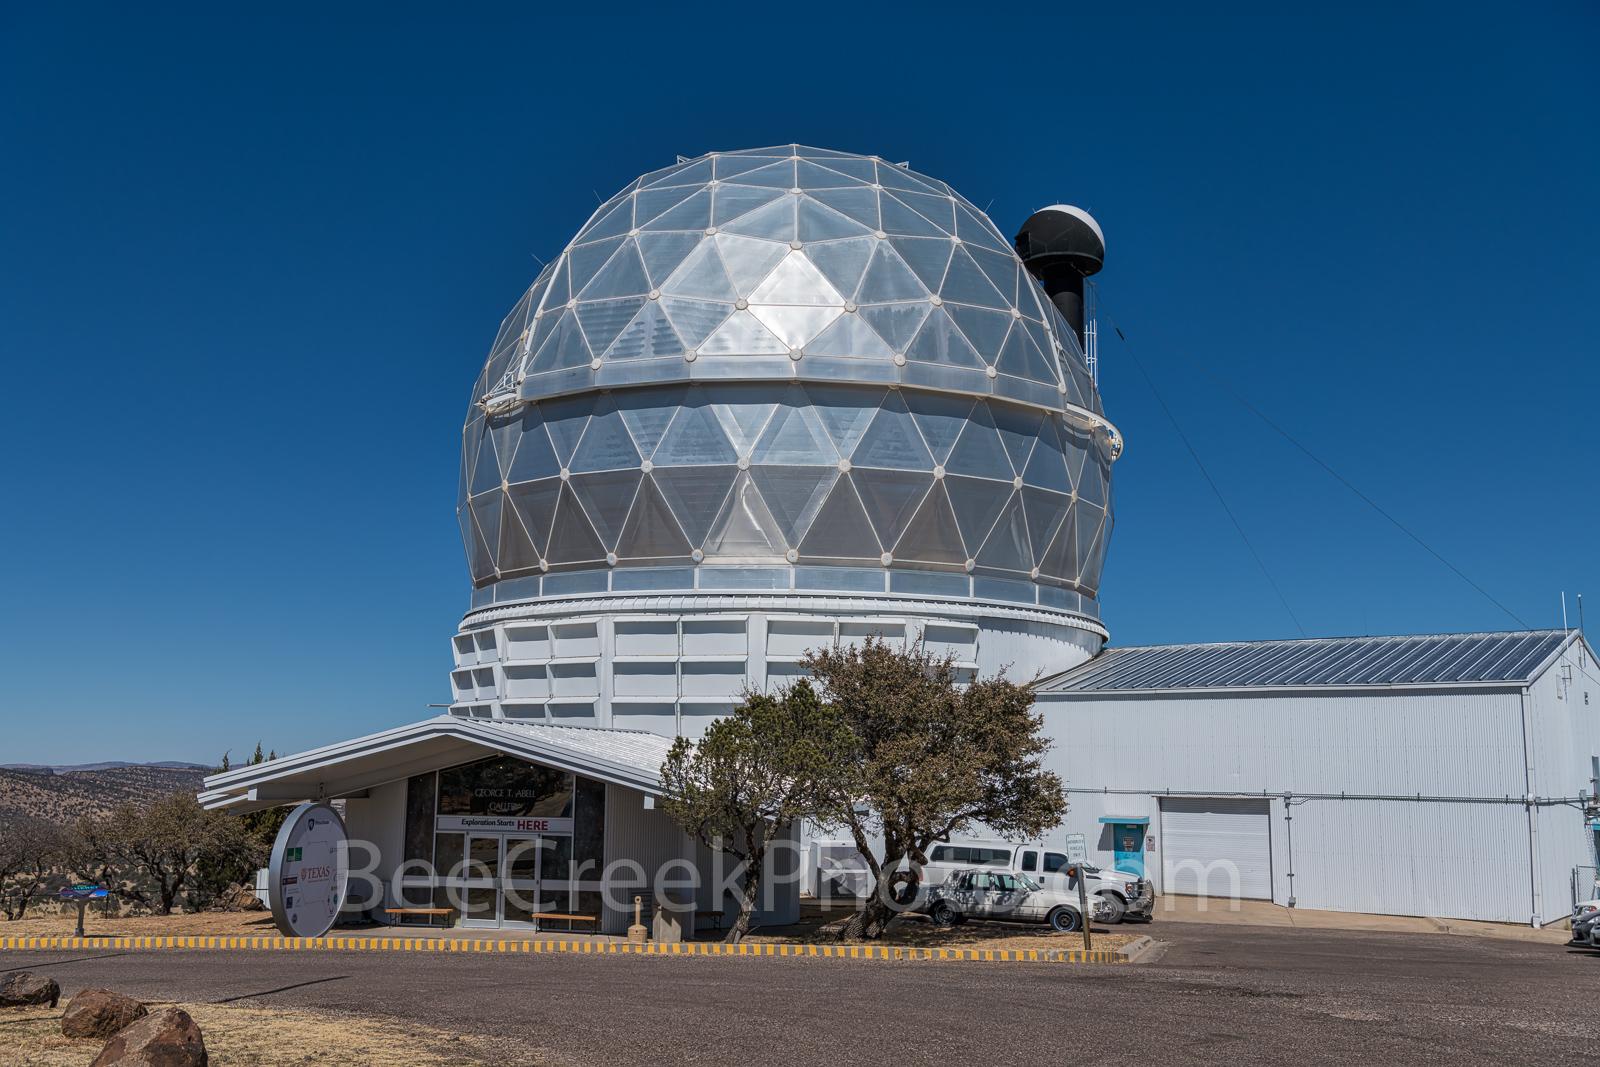 Davis Mountains, Hobby-Eberly Telescope, optical, UT, Mt. Fowlkes, elevation 6660 ft, Fort Davis, Texas, USA, photo